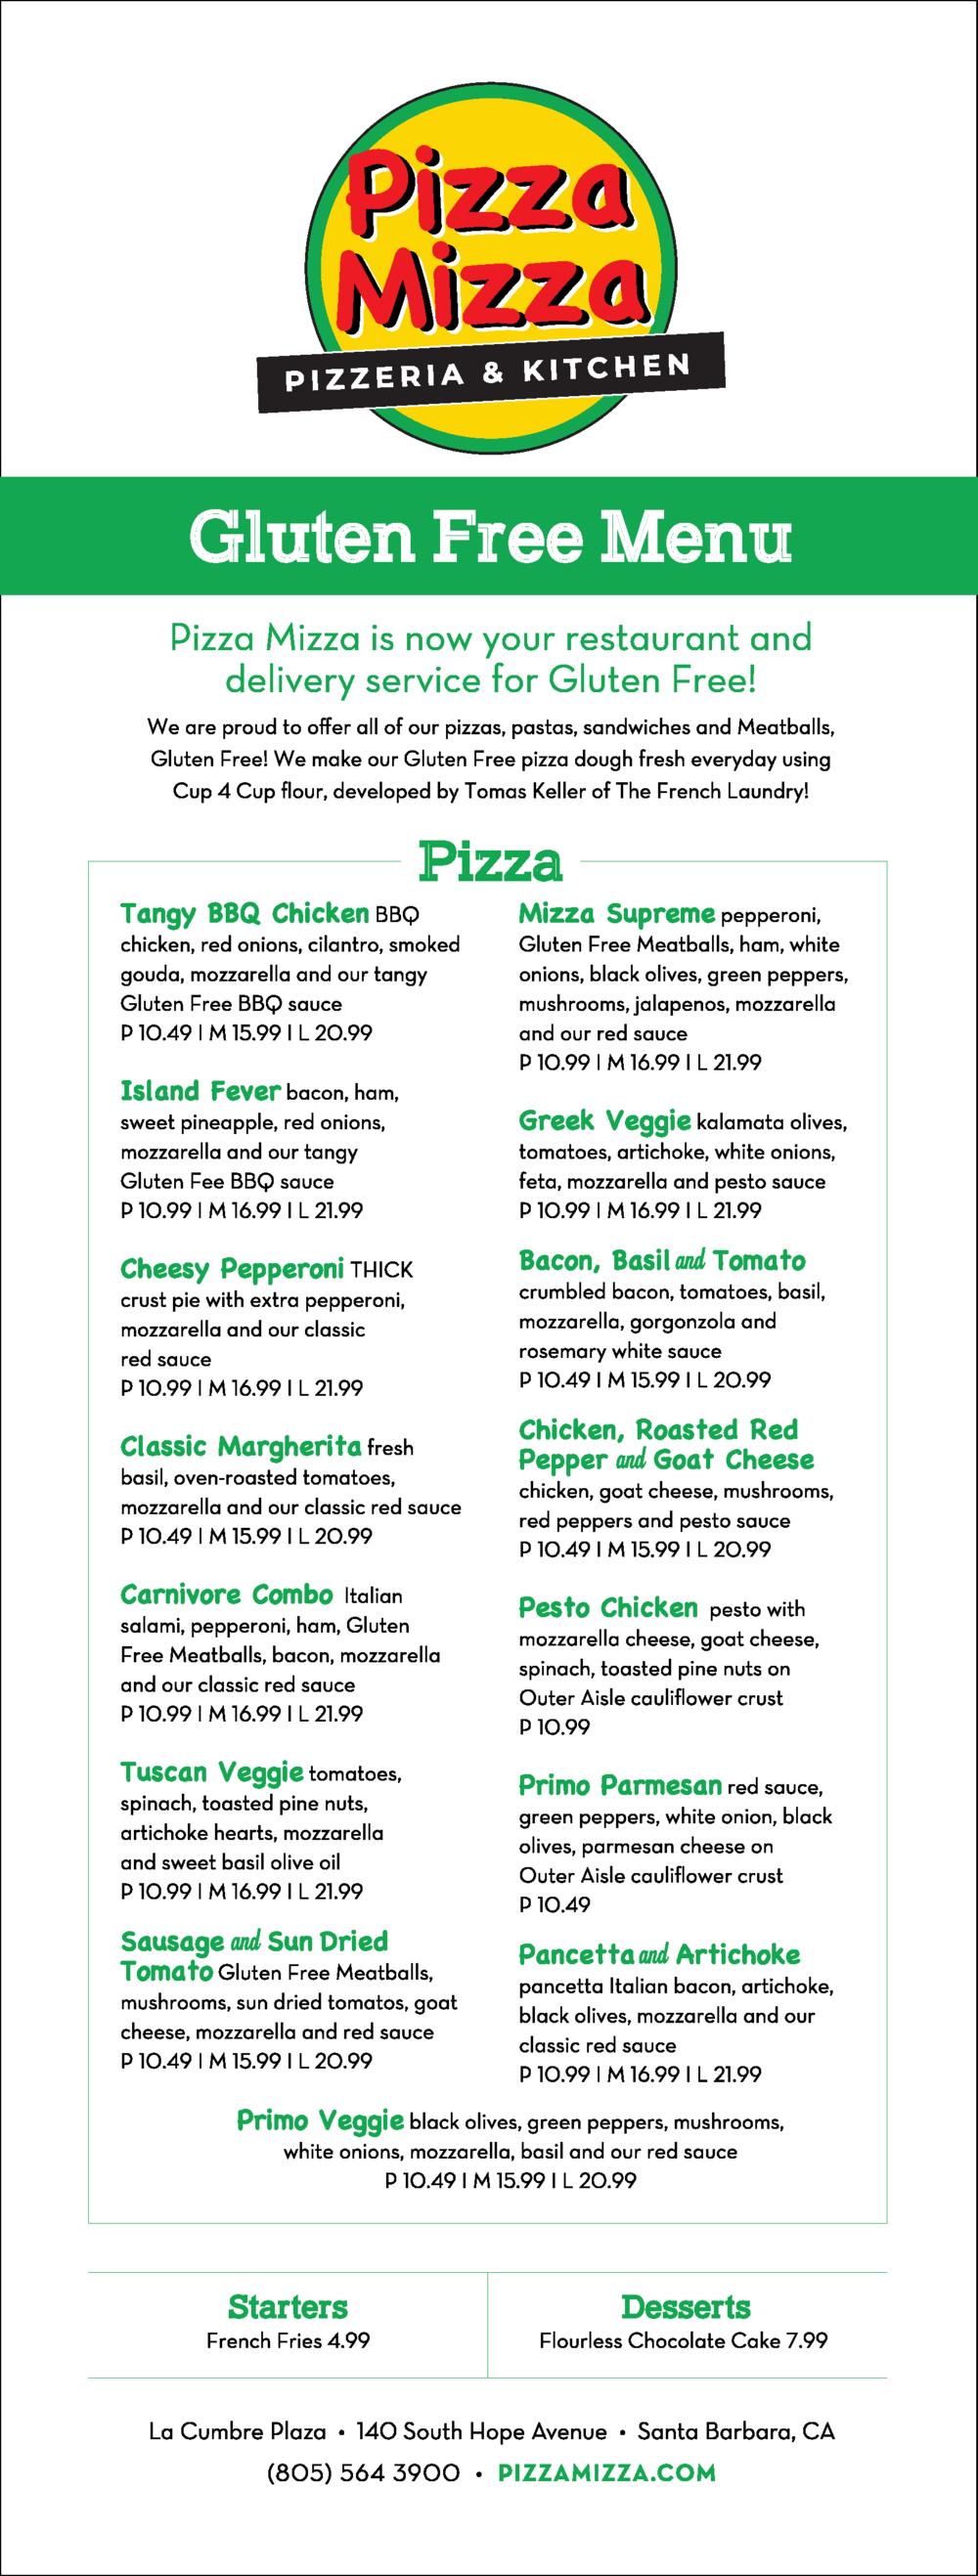 Pizza Mizza Gluten Free Menu